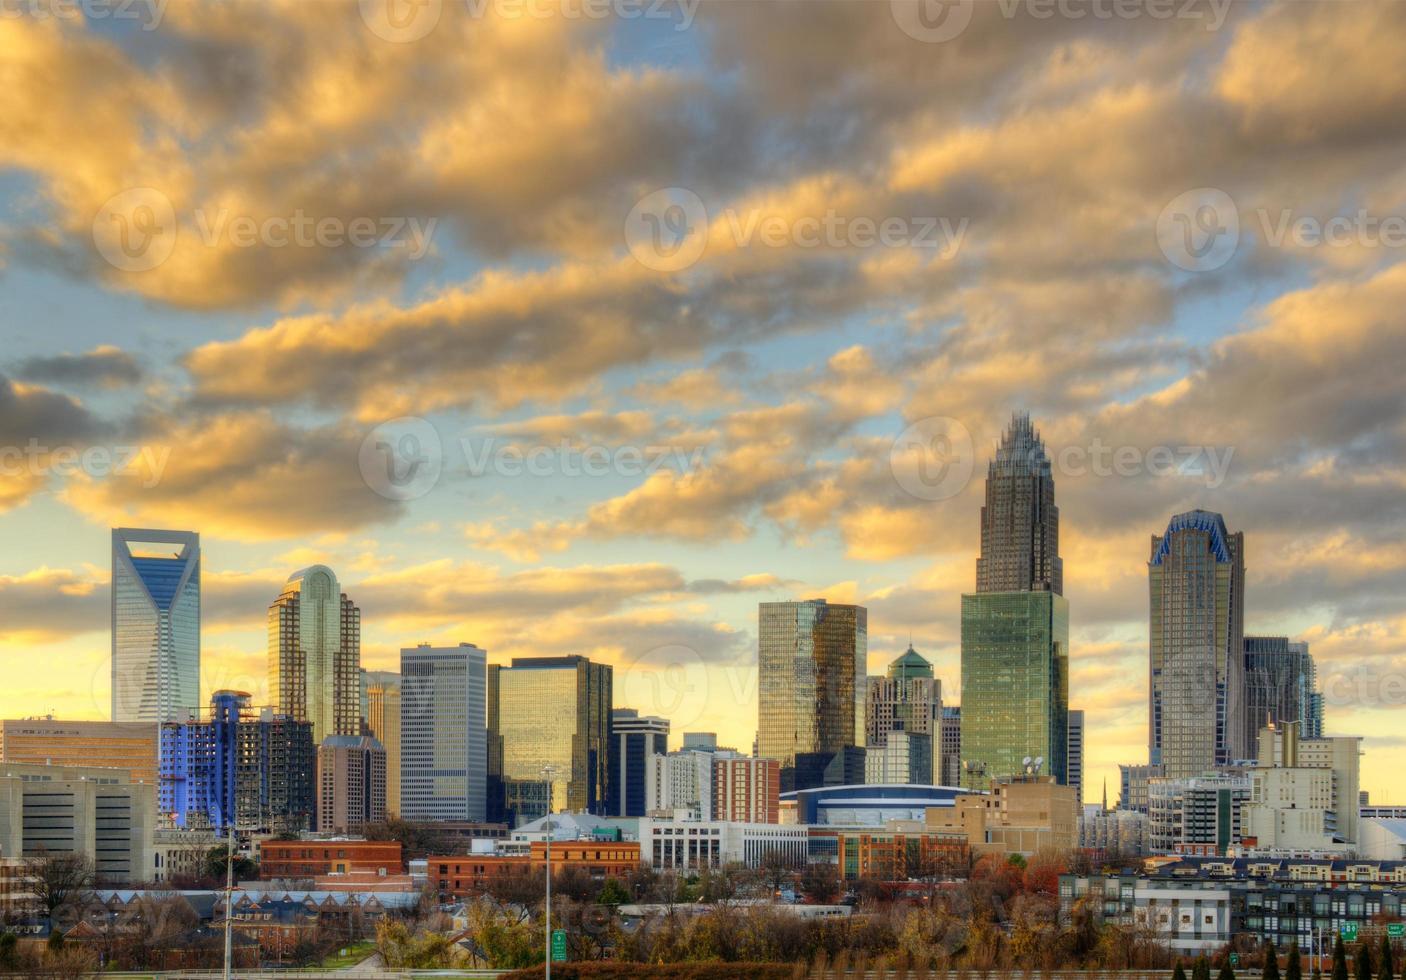 Skyline de Uptown Charlotte au coucher du soleil photo